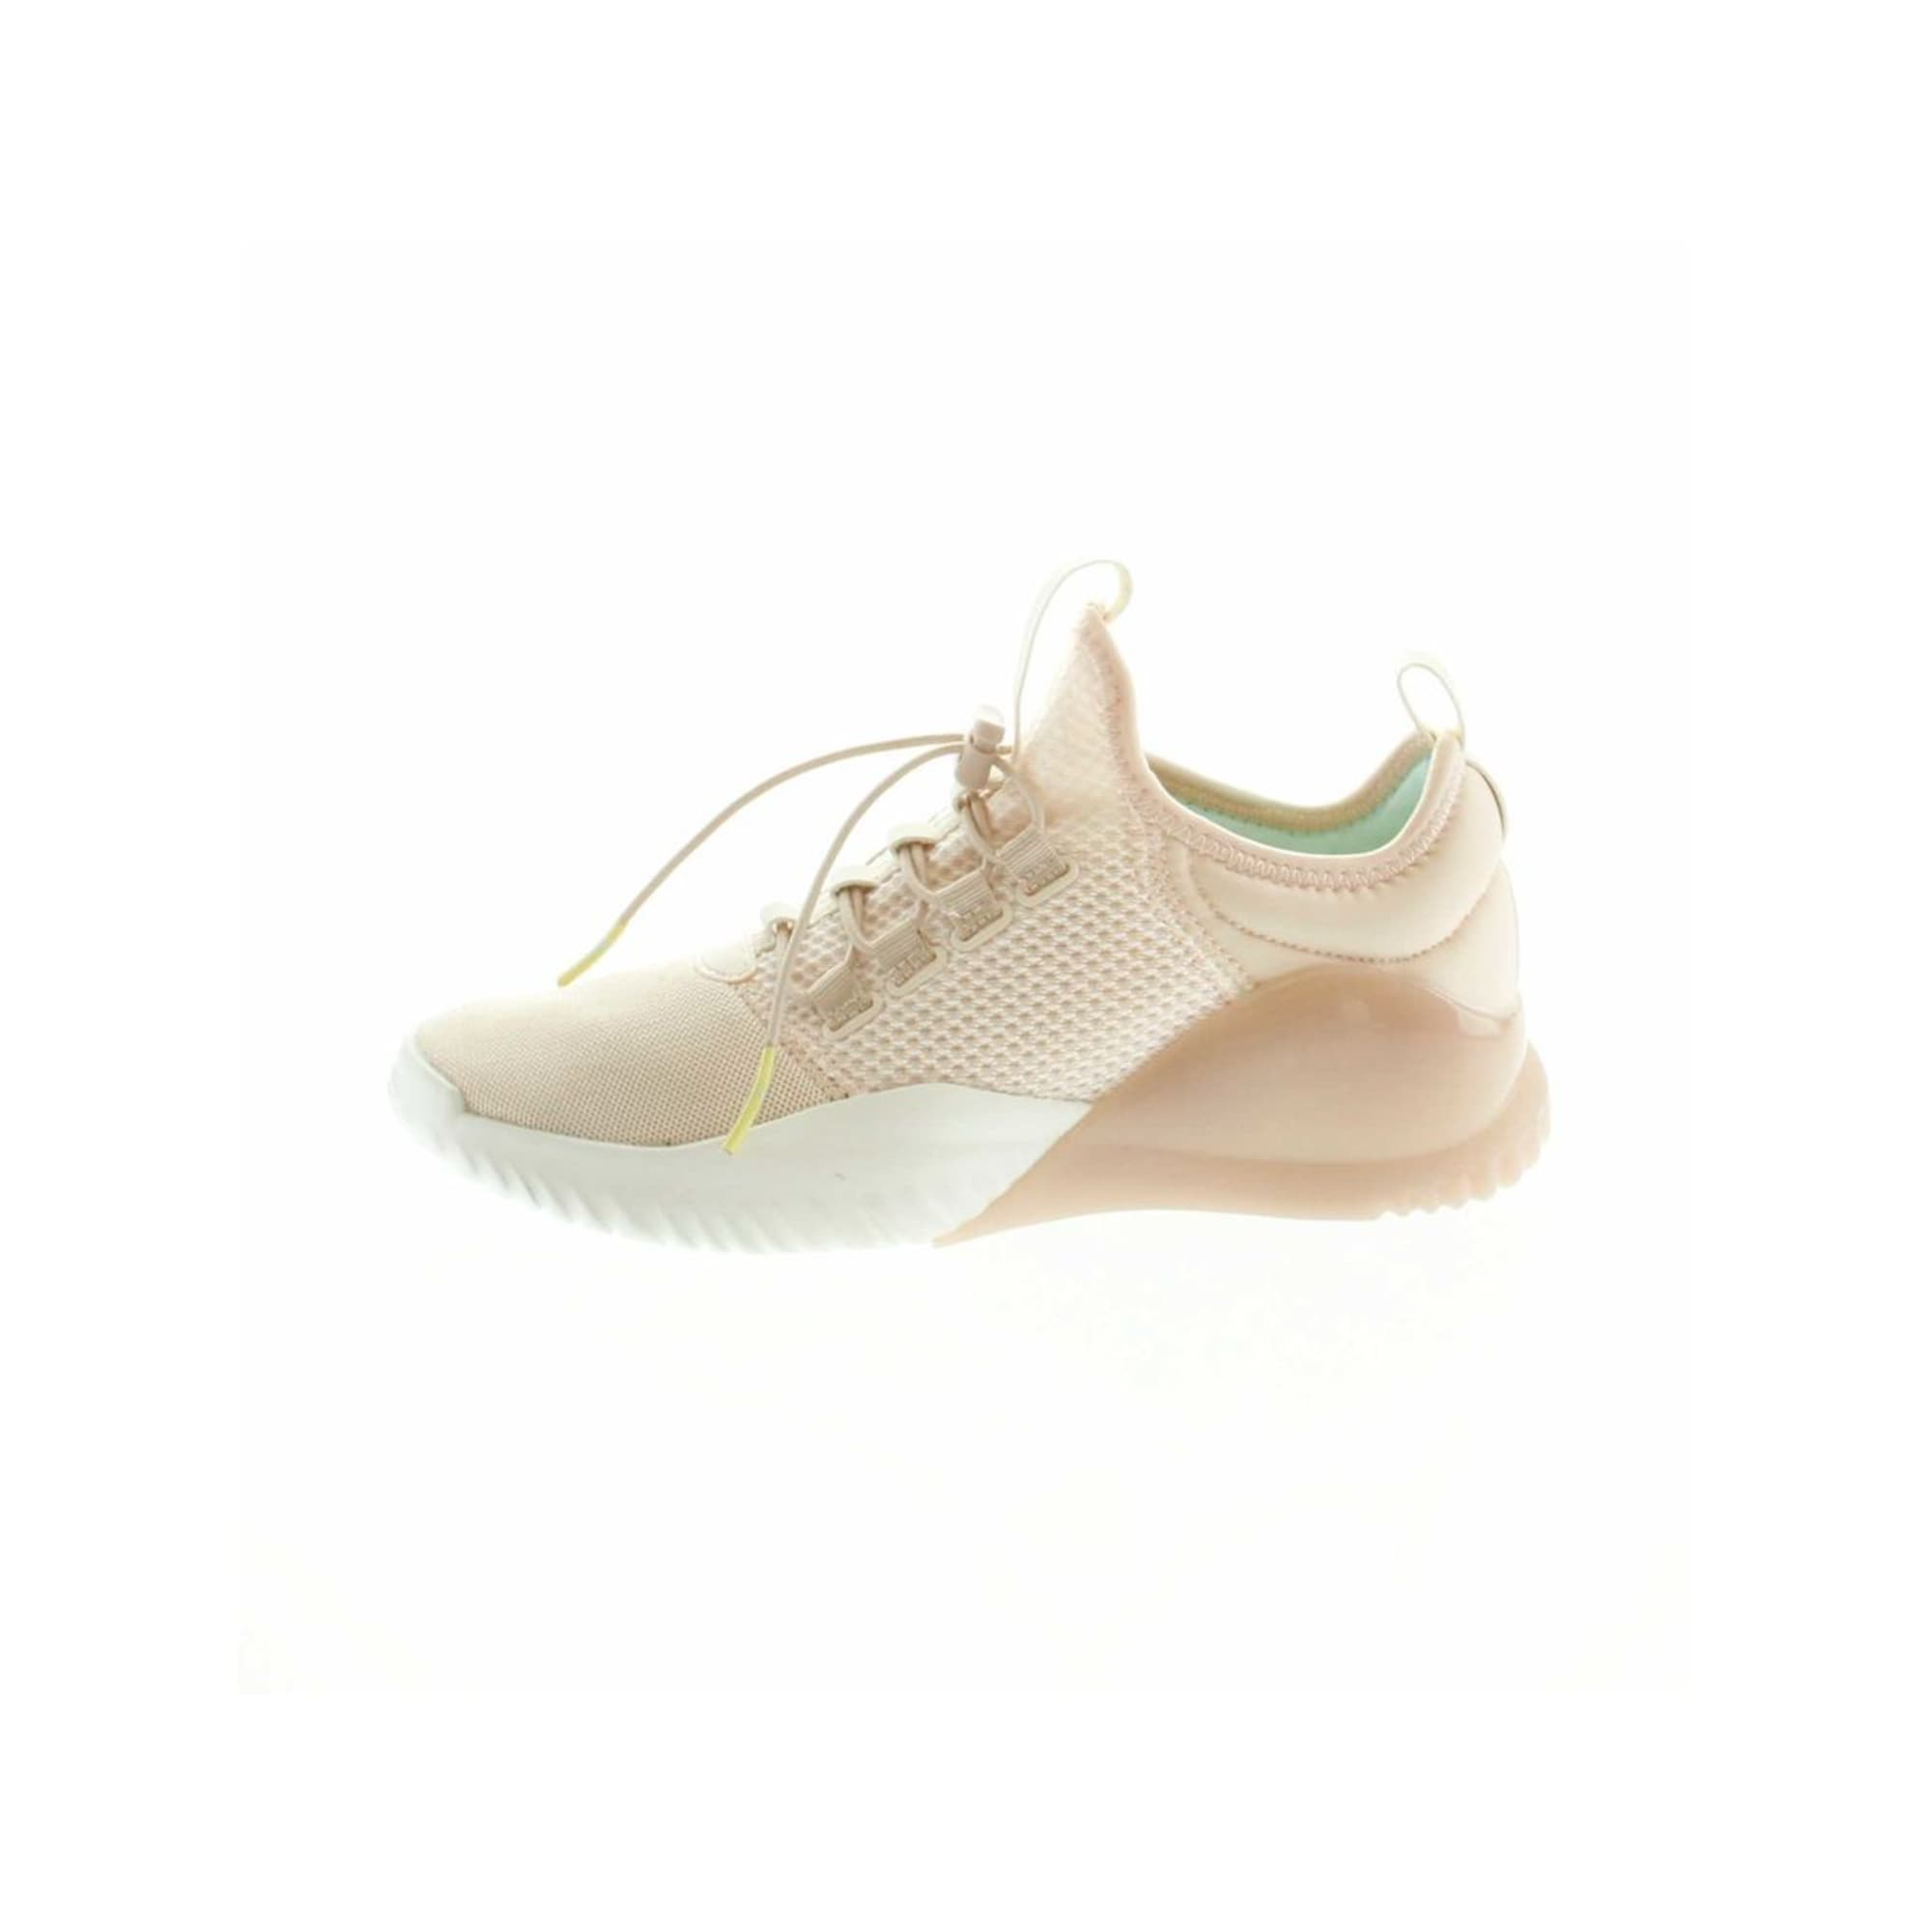 Schnürschuhe   Schuhe > Schnürschuhe   Rosa   tamaris